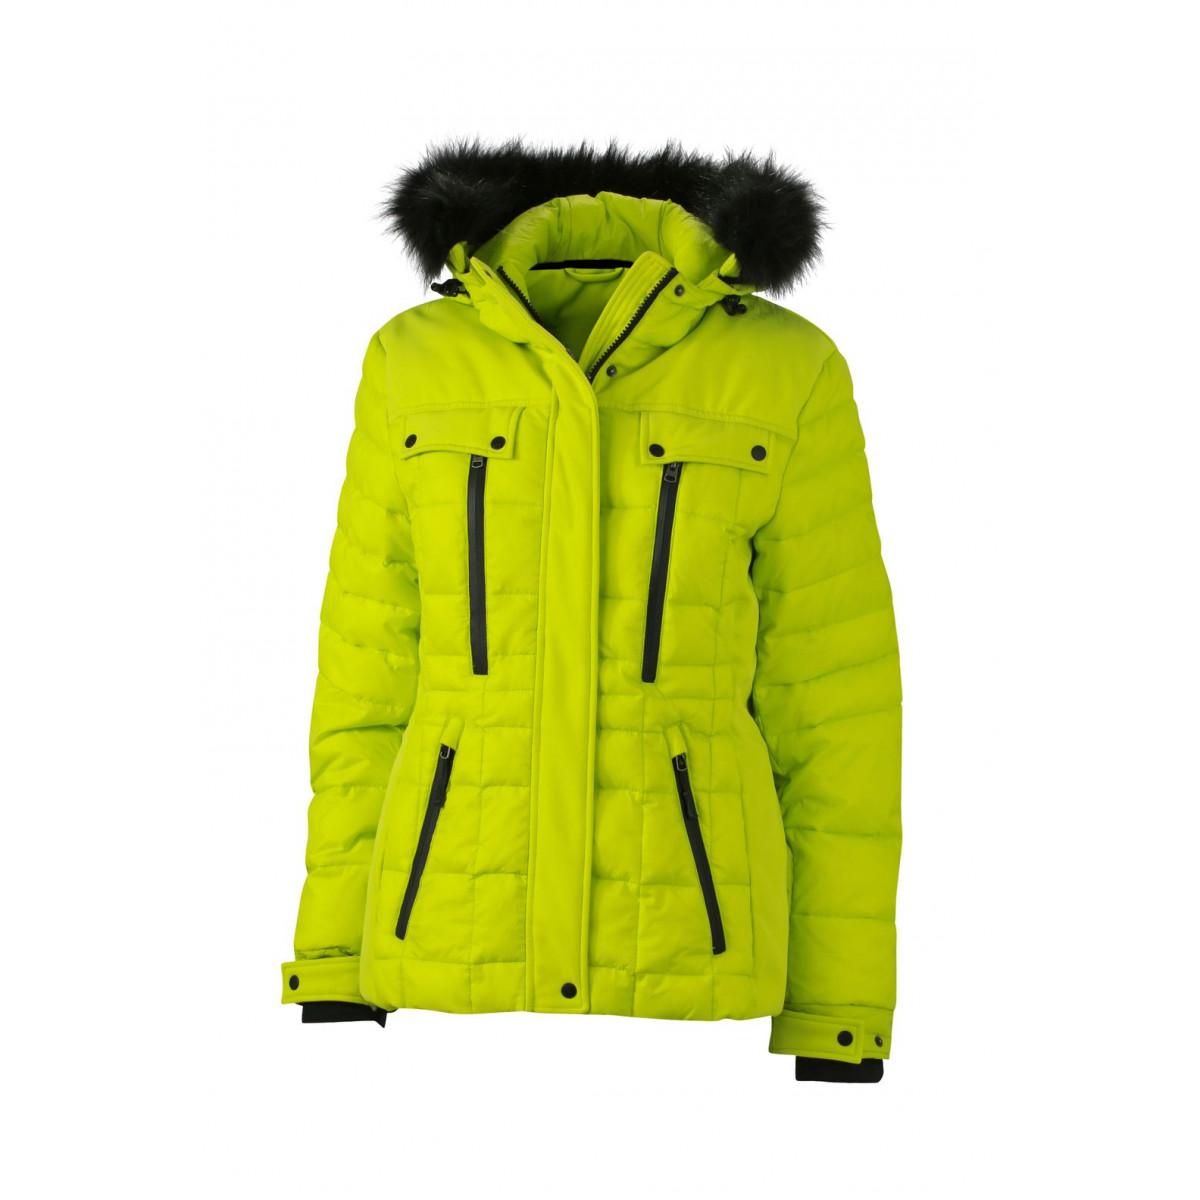 Куртка женская JN1101 Ladies Wintersport Jacket - Ярко-желтый/Черный